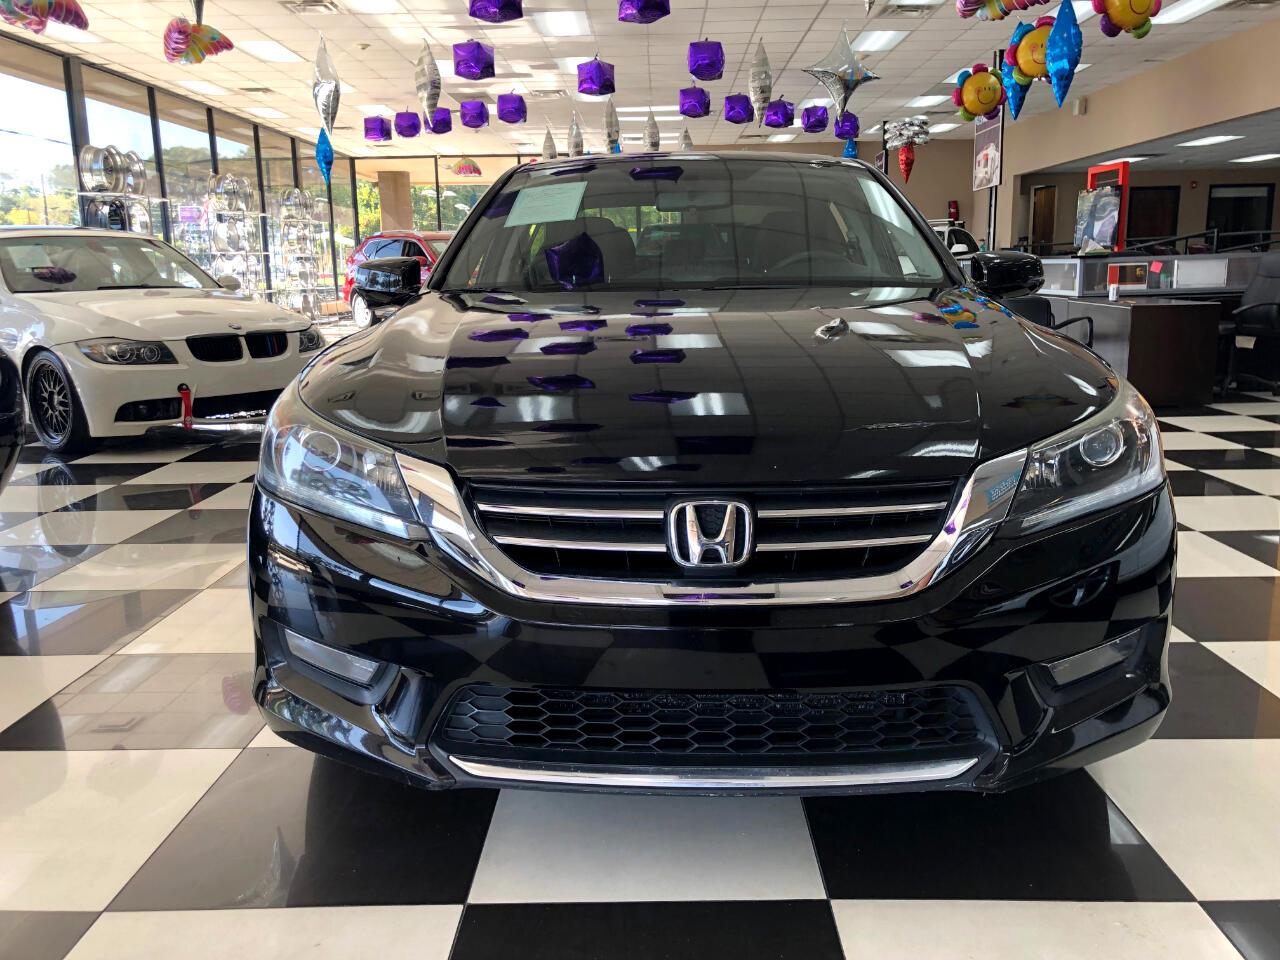 2015 Honda Accord Sedan 4dr I4 CVT EX